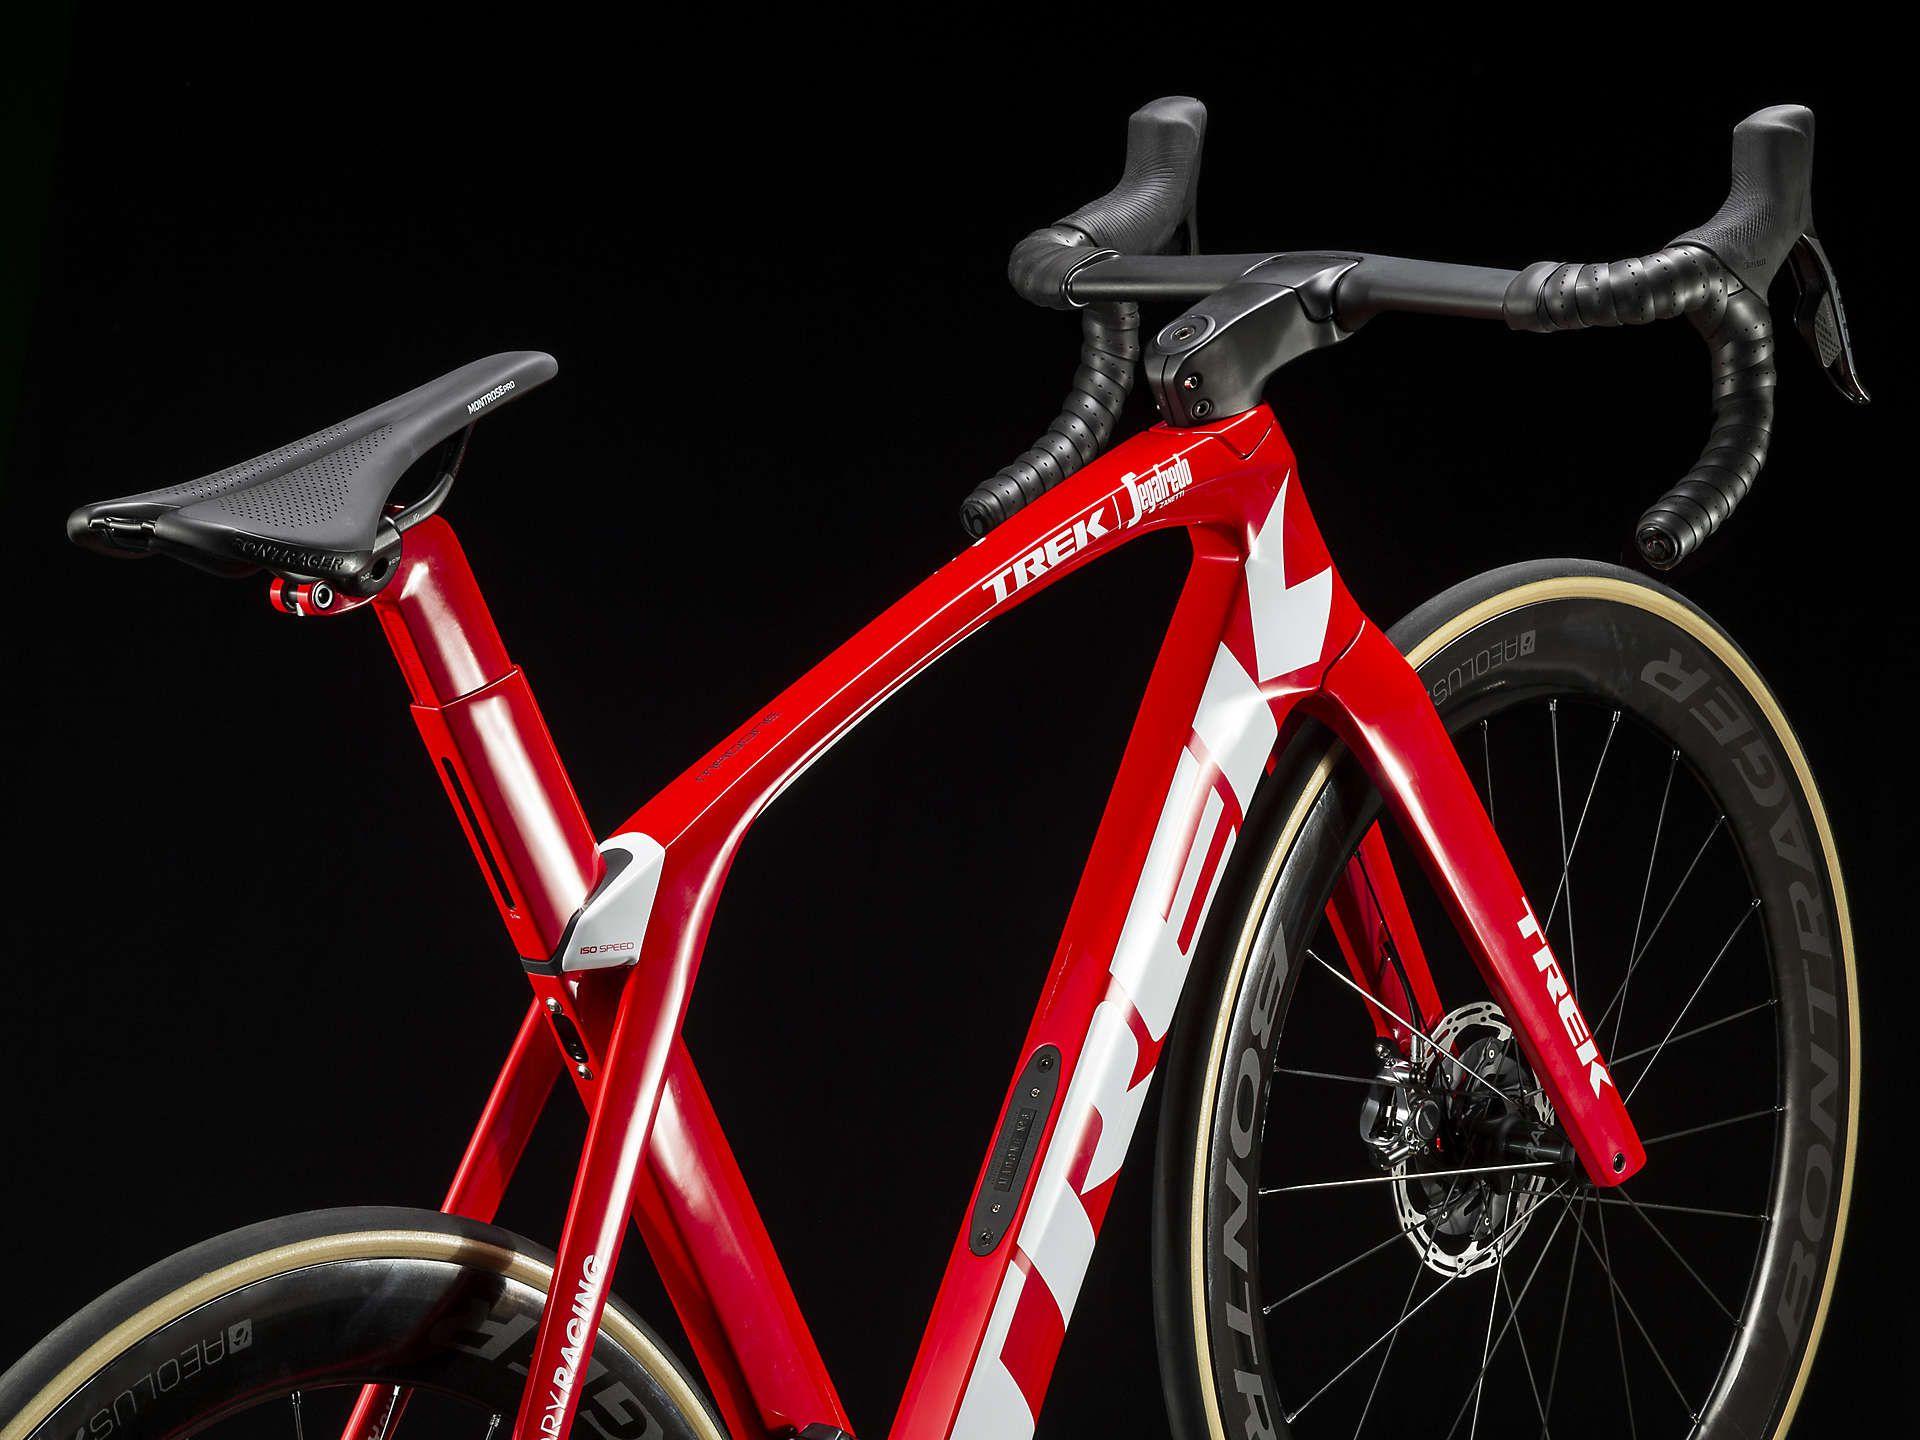 Bicicleta Trek Madone SLR 9 Disc eTap - Tamanho 54  por R$ 84.550,00 - 2020